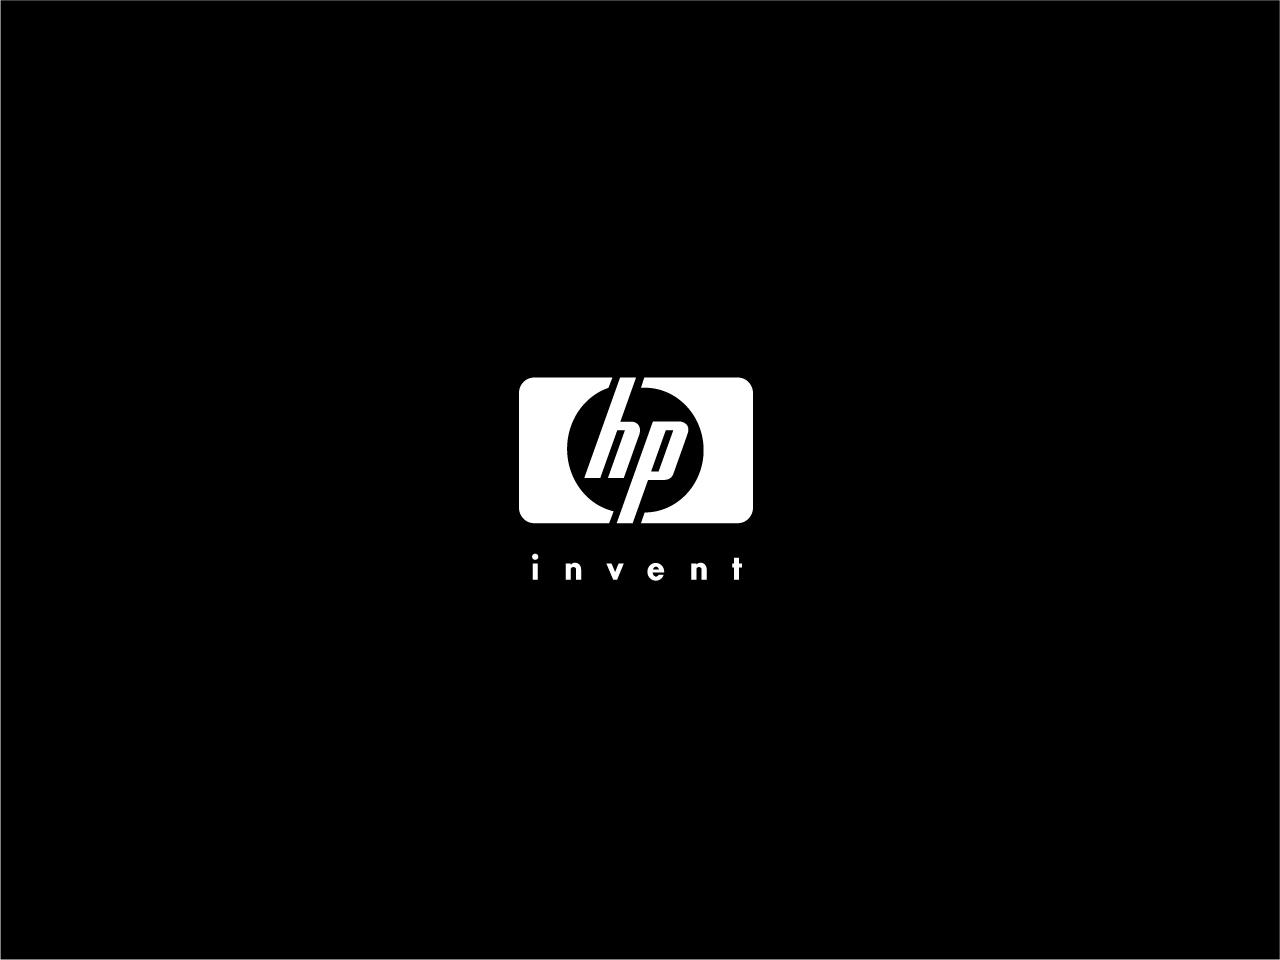 Free Download Hp Logo Wallpaper 1280x960 For Your Desktop